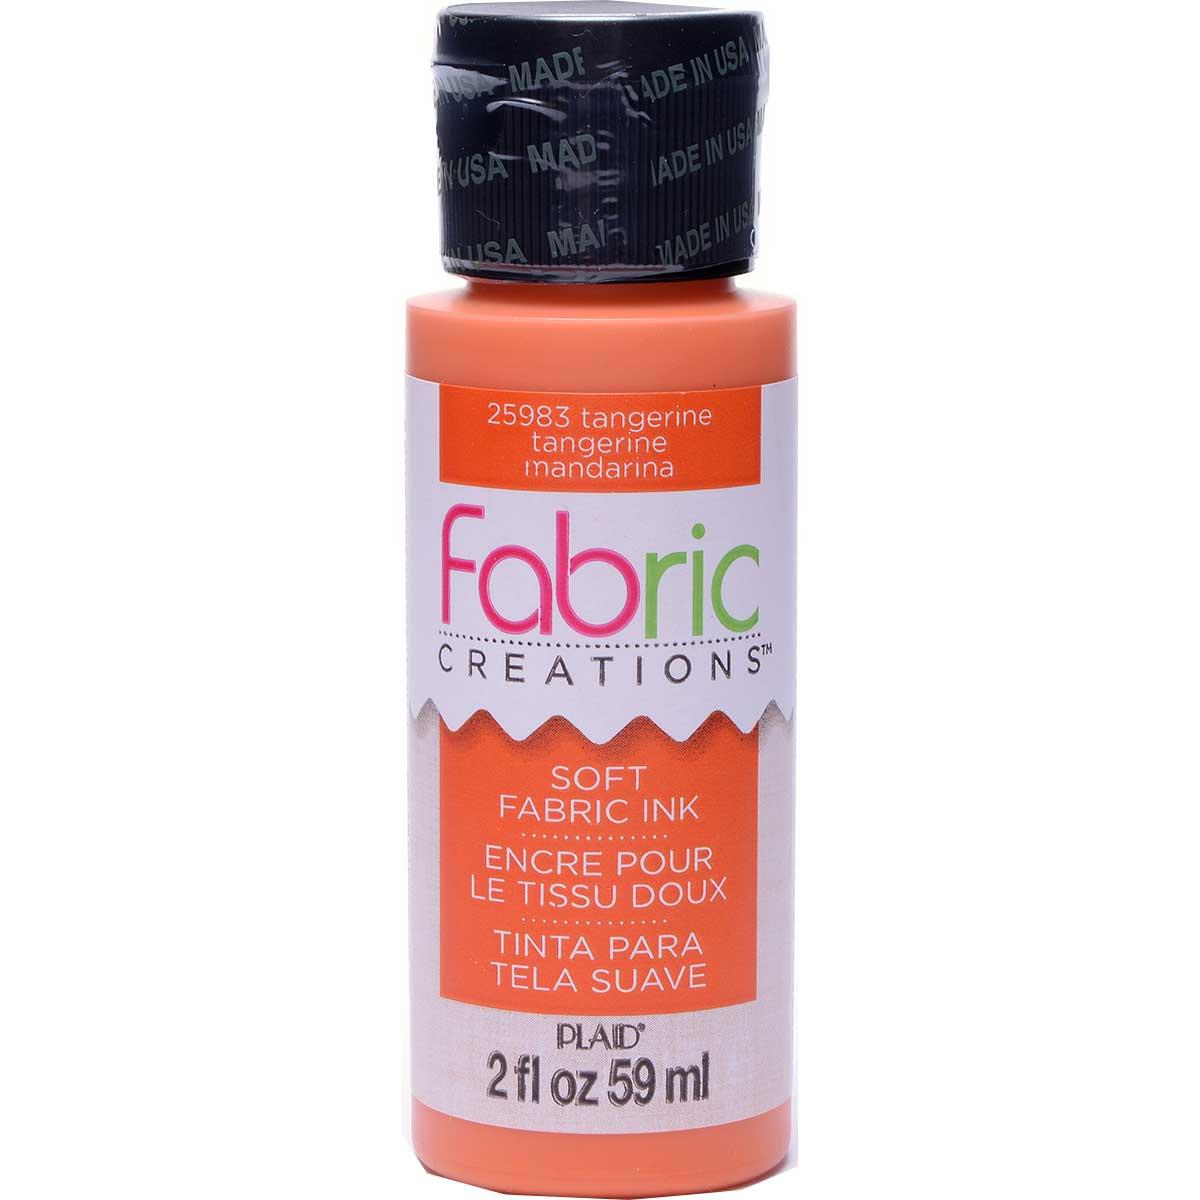 Fabric Creations™ Soft Fabric Inks - Tangerine, 2 oz.